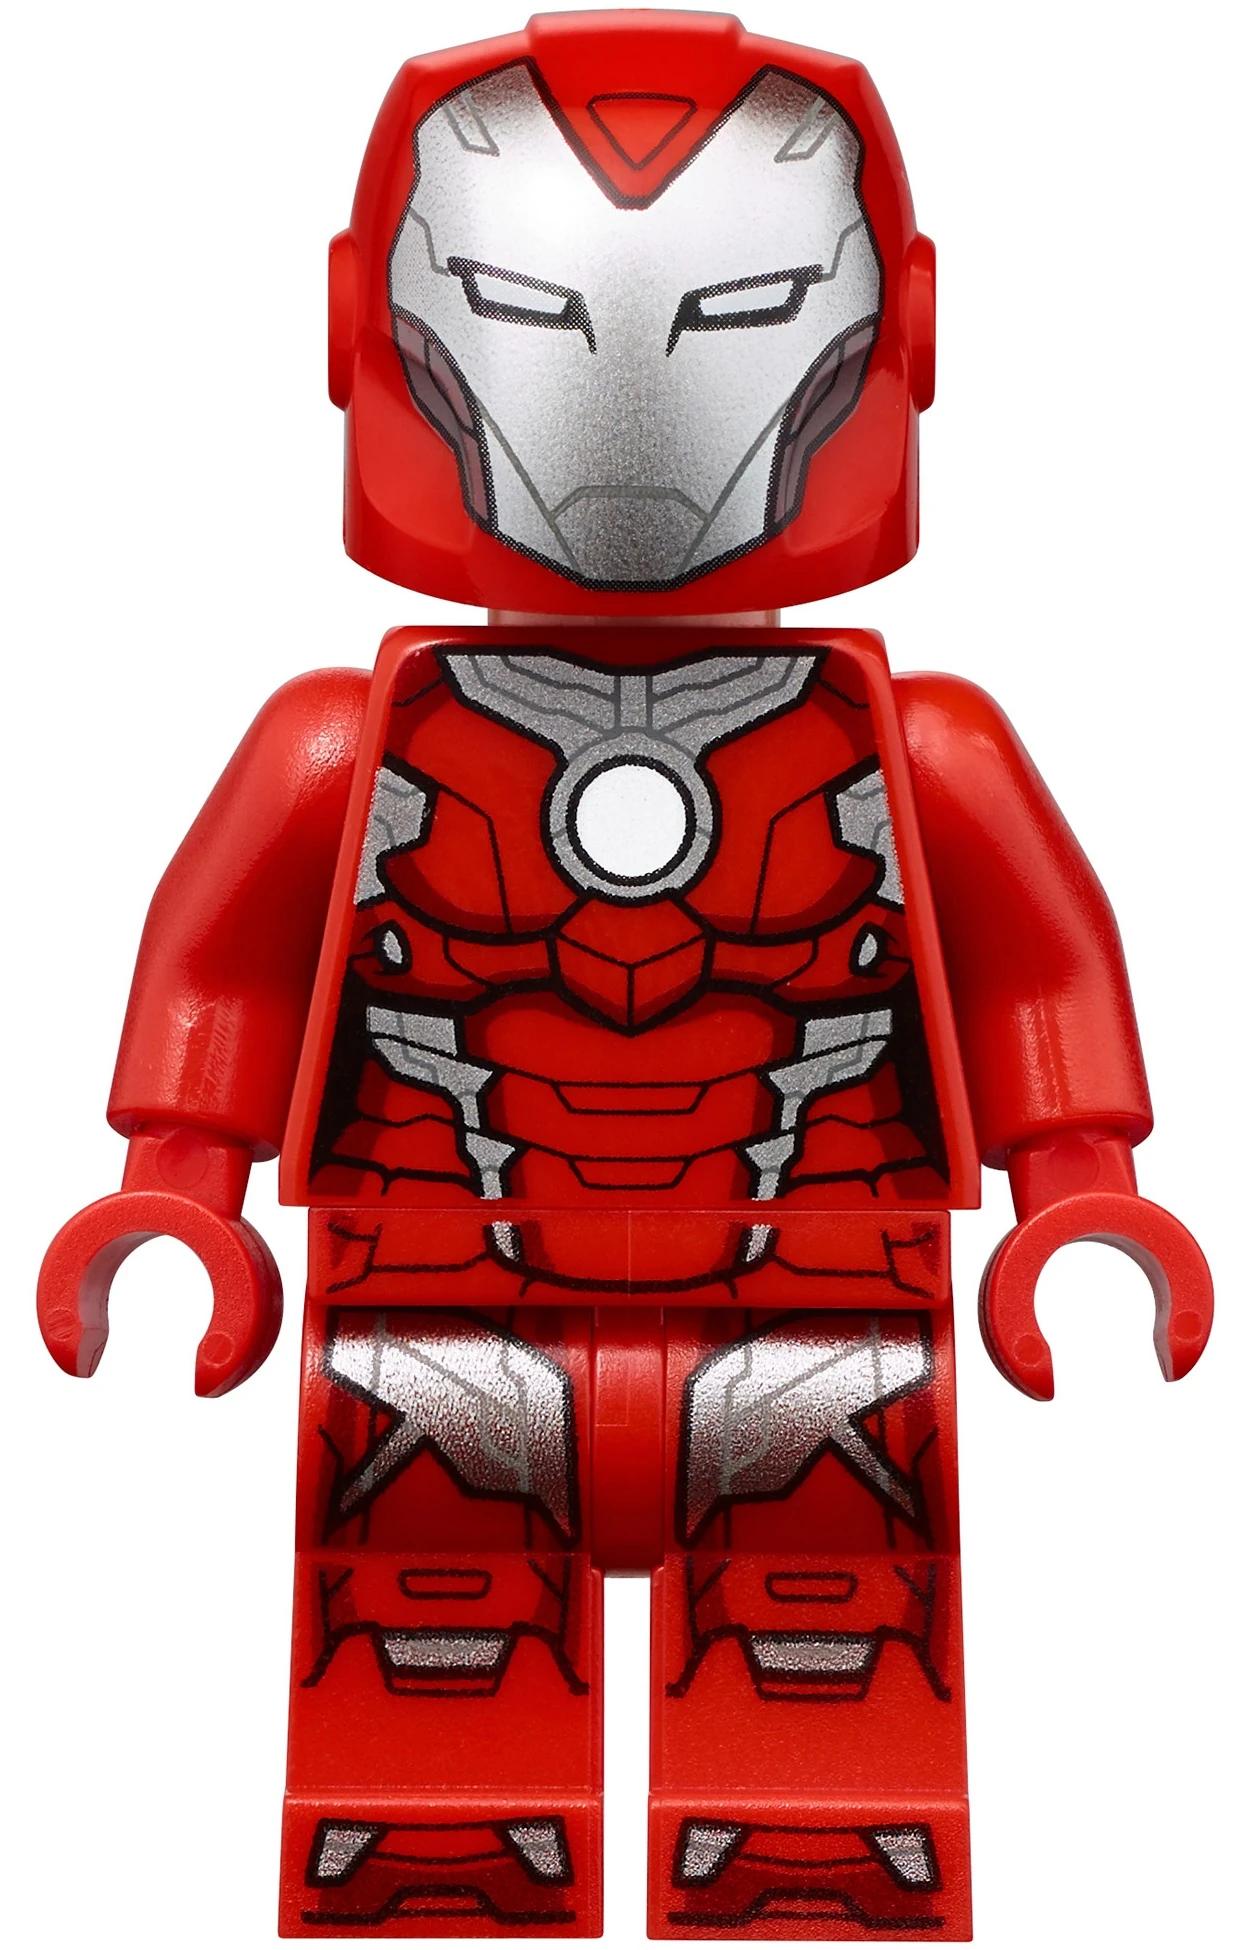 Rescue (Marvel)